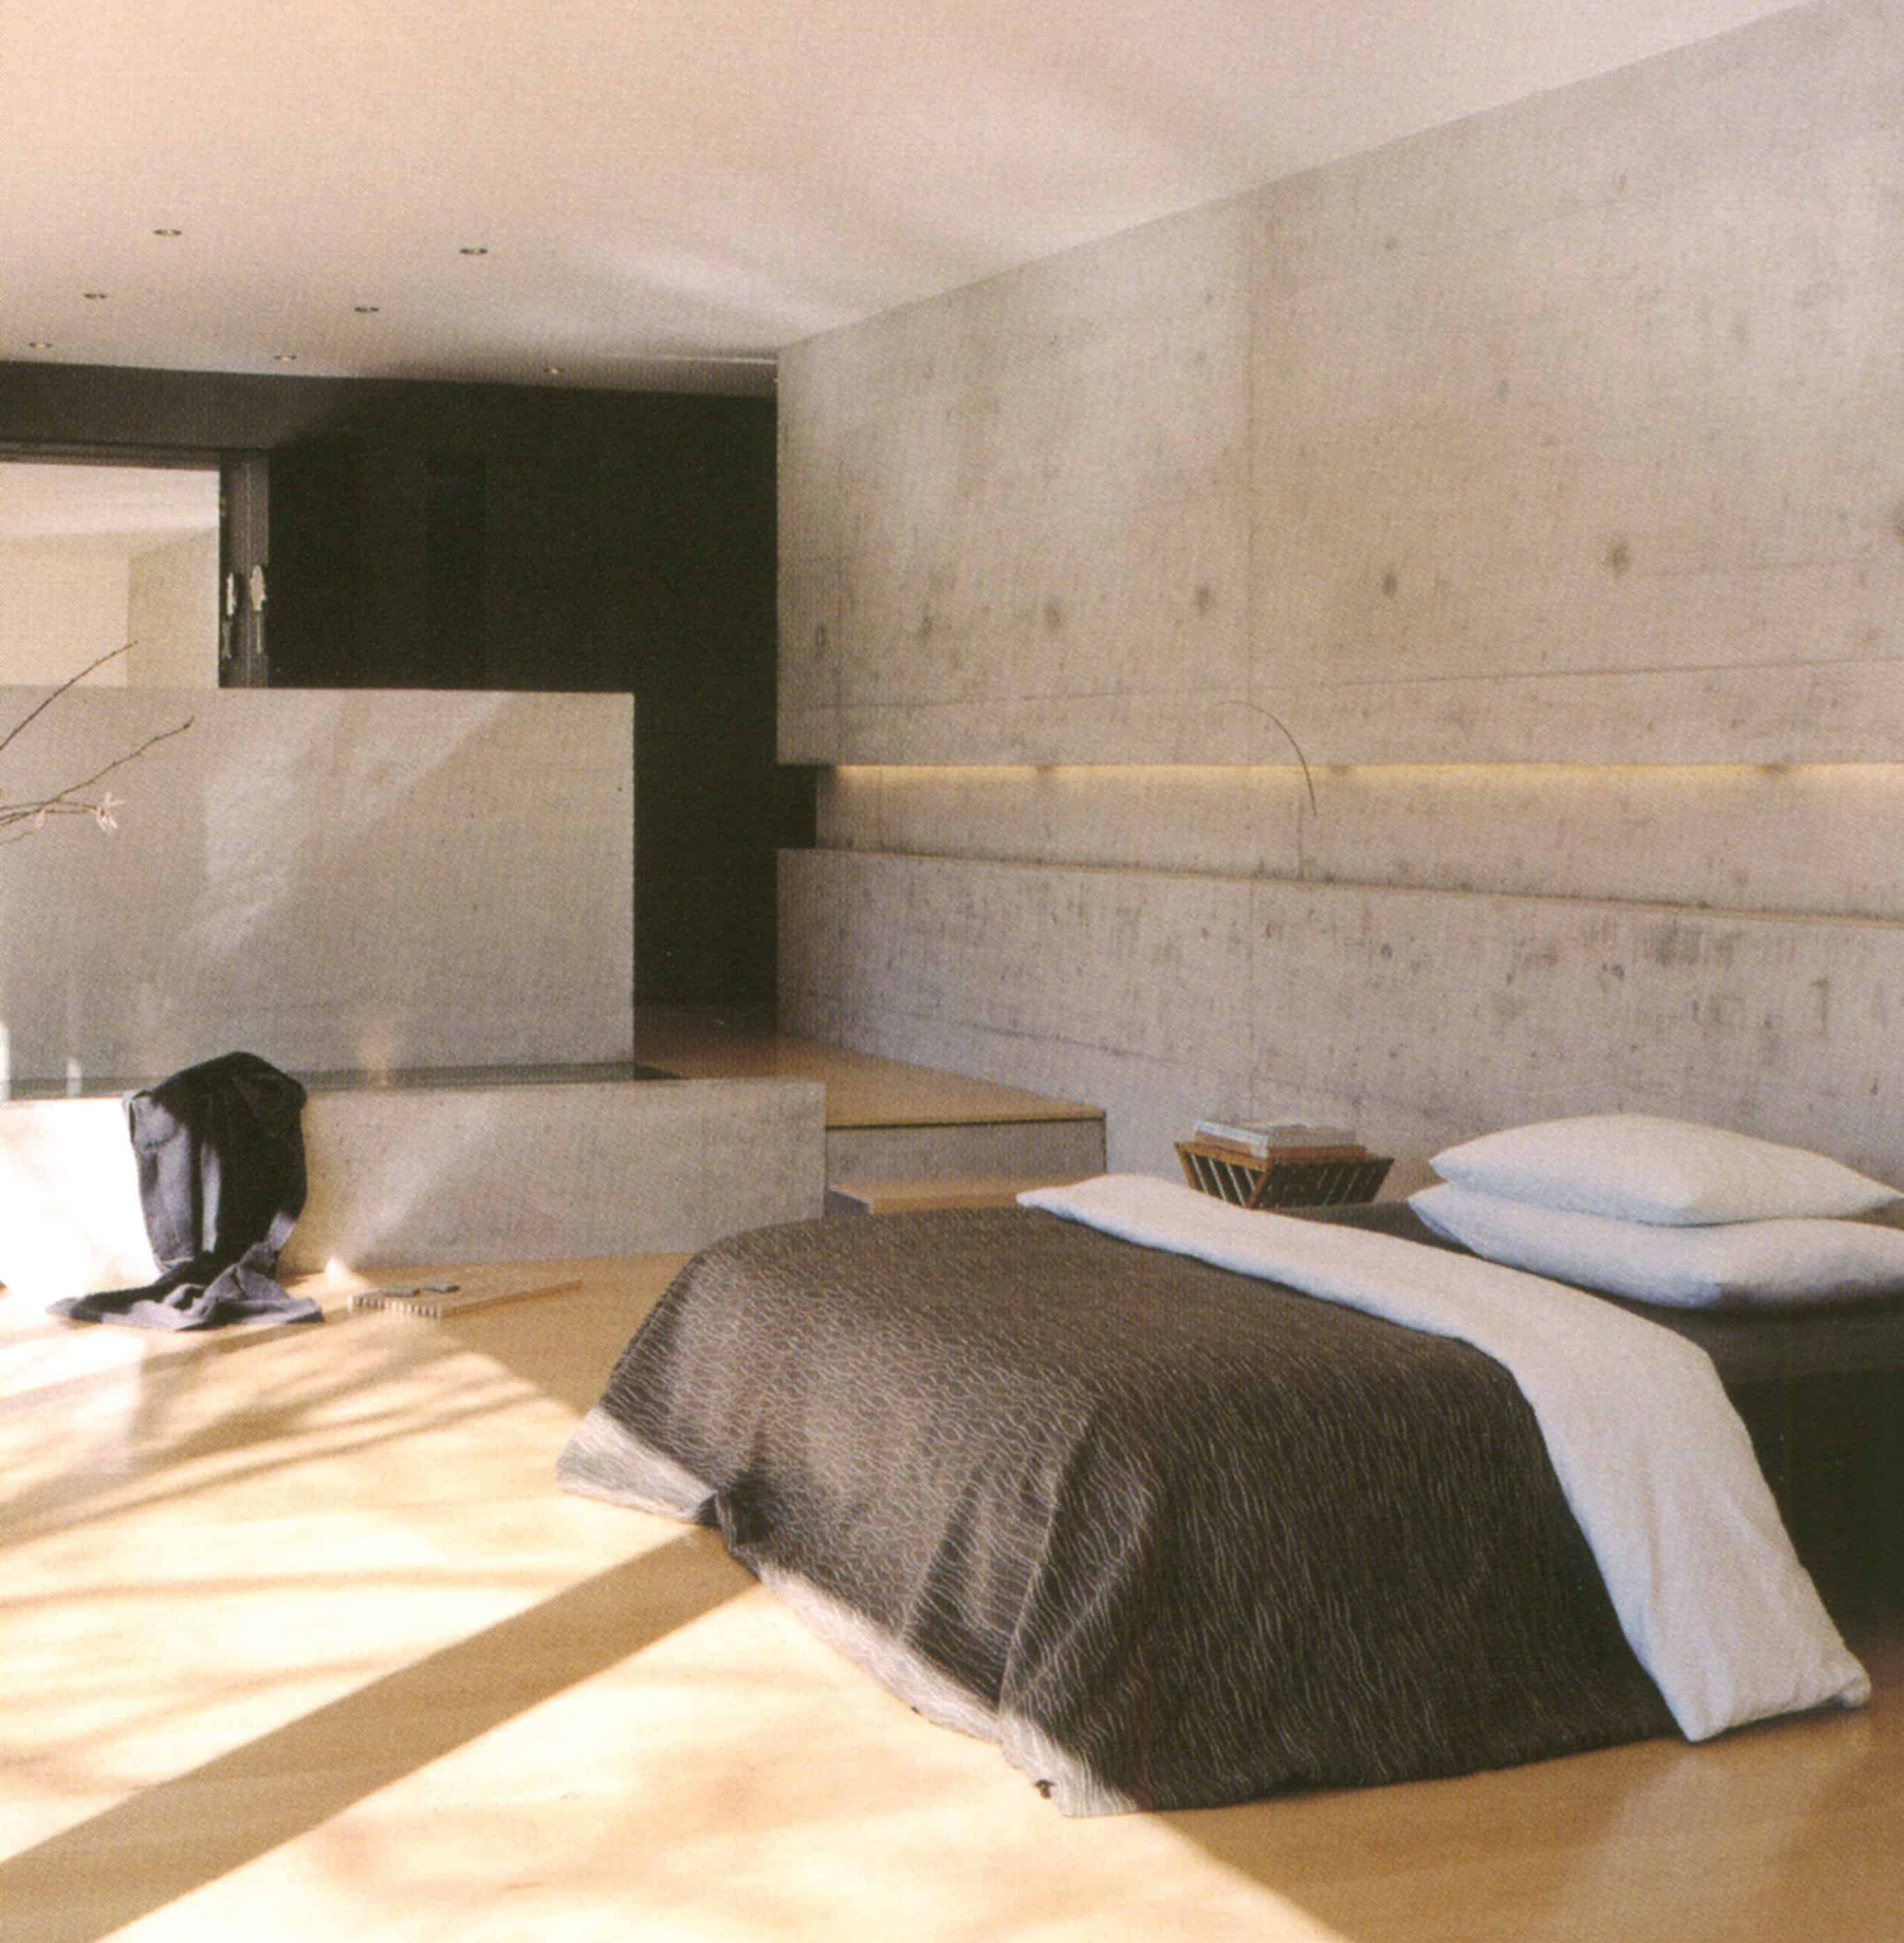 FORBELI Home – Wellness Hotel Interior Design Upgrade